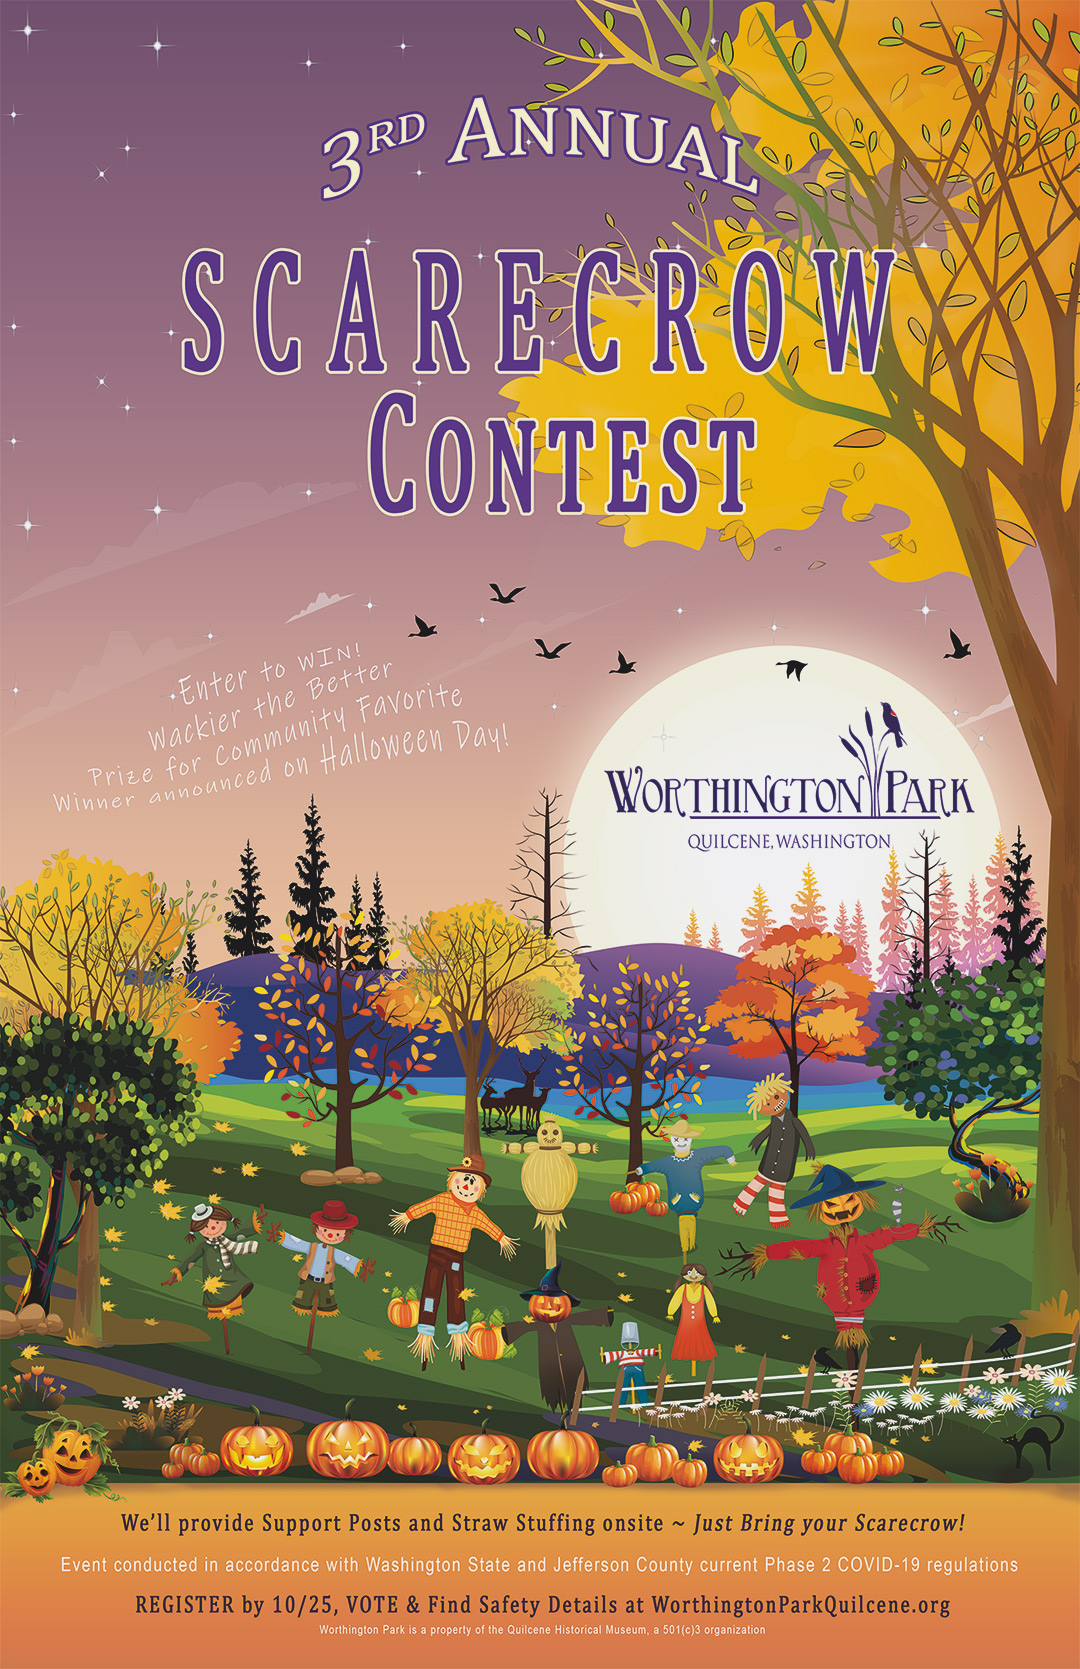 2020 Scarecrow Contest poster